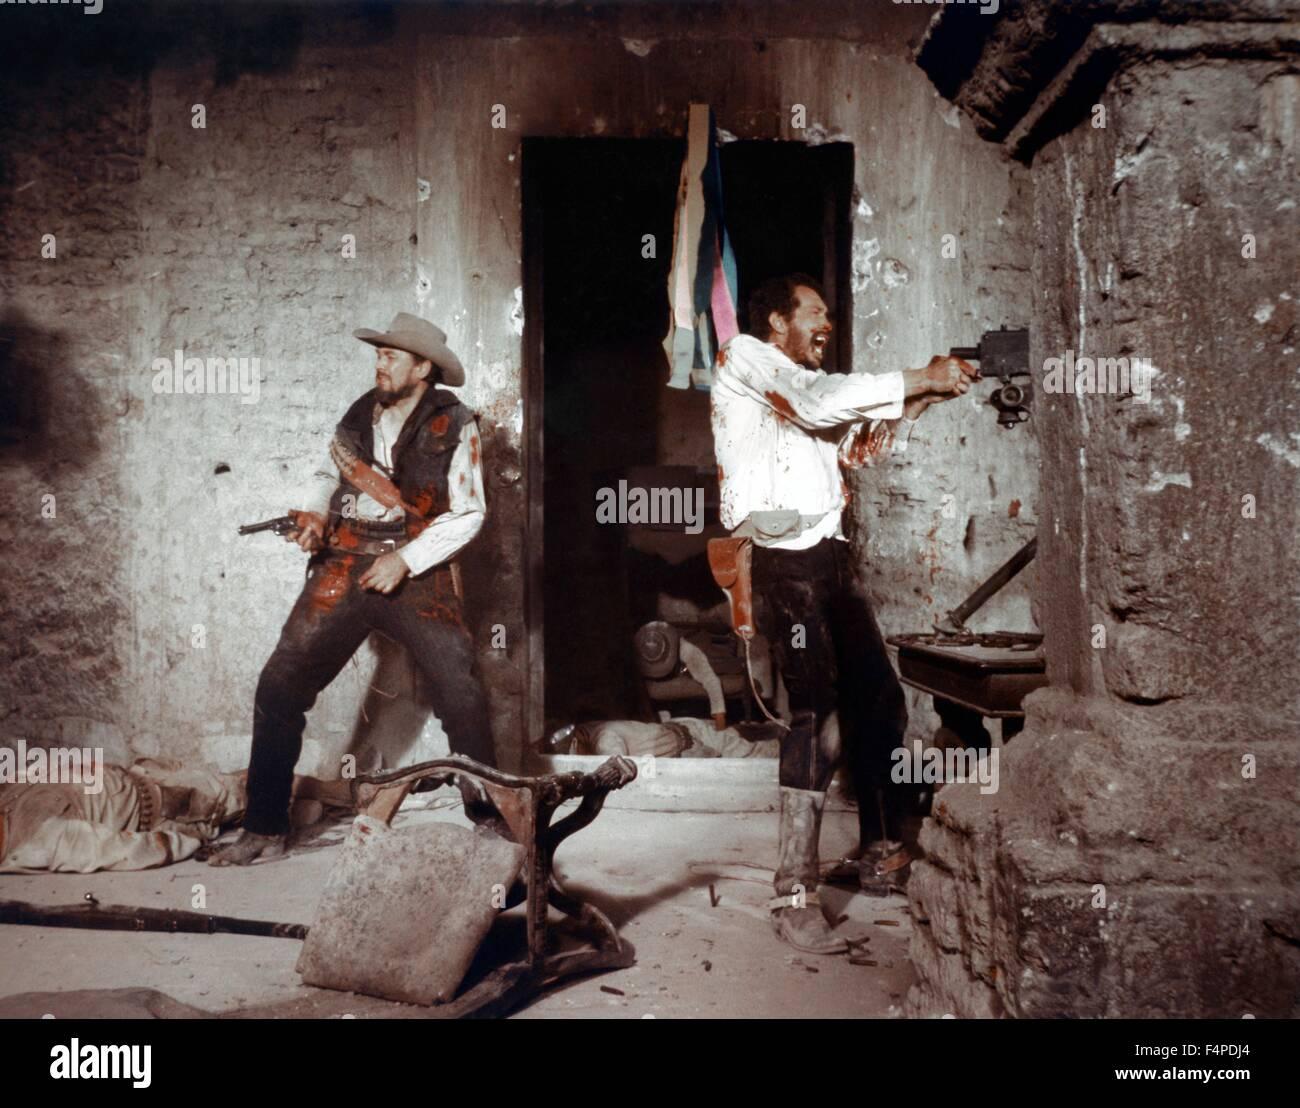 Ben Johnson, Warren Oates / The Wild Bunch 1969 directed by Sam Peckinpah - Stock Image